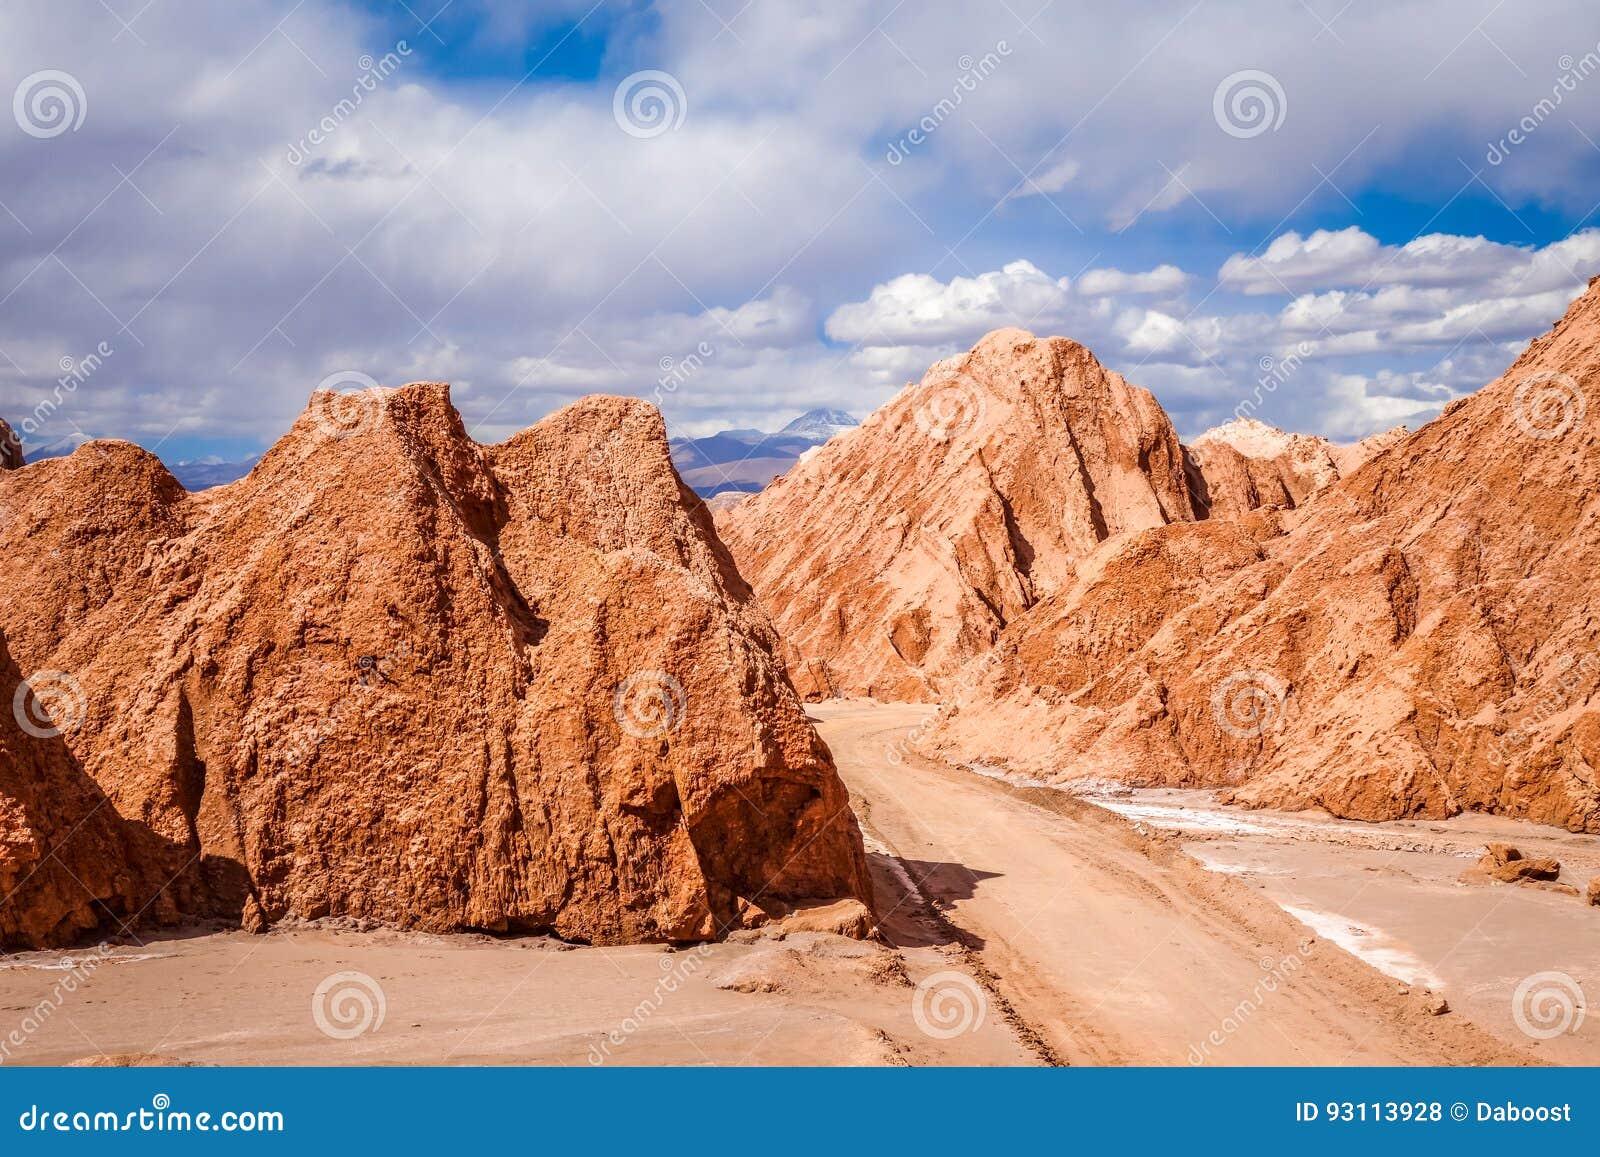 Valle De La Muerte En San Pedro De Atacama Chile Foto De Archivo Imagen De Pedro Arena 93113928